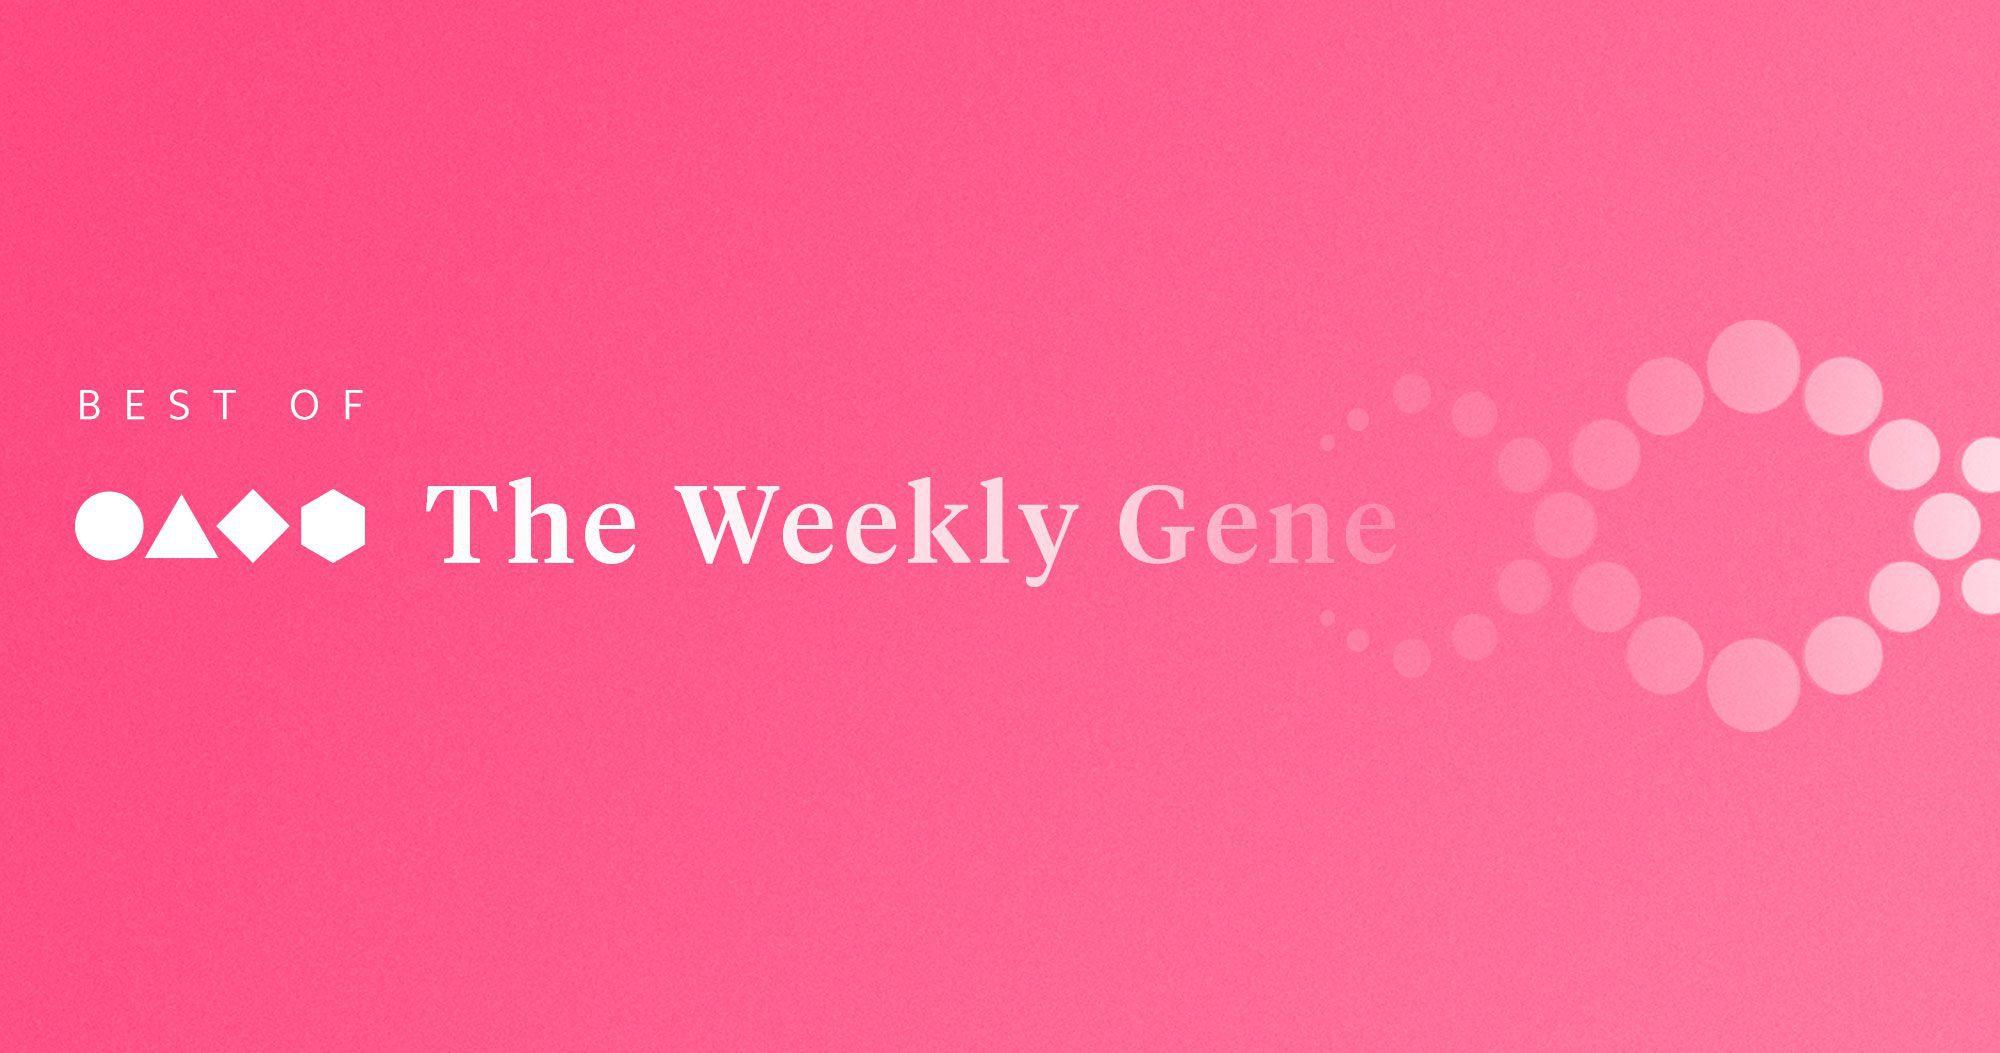 Best of The Weekly Gene